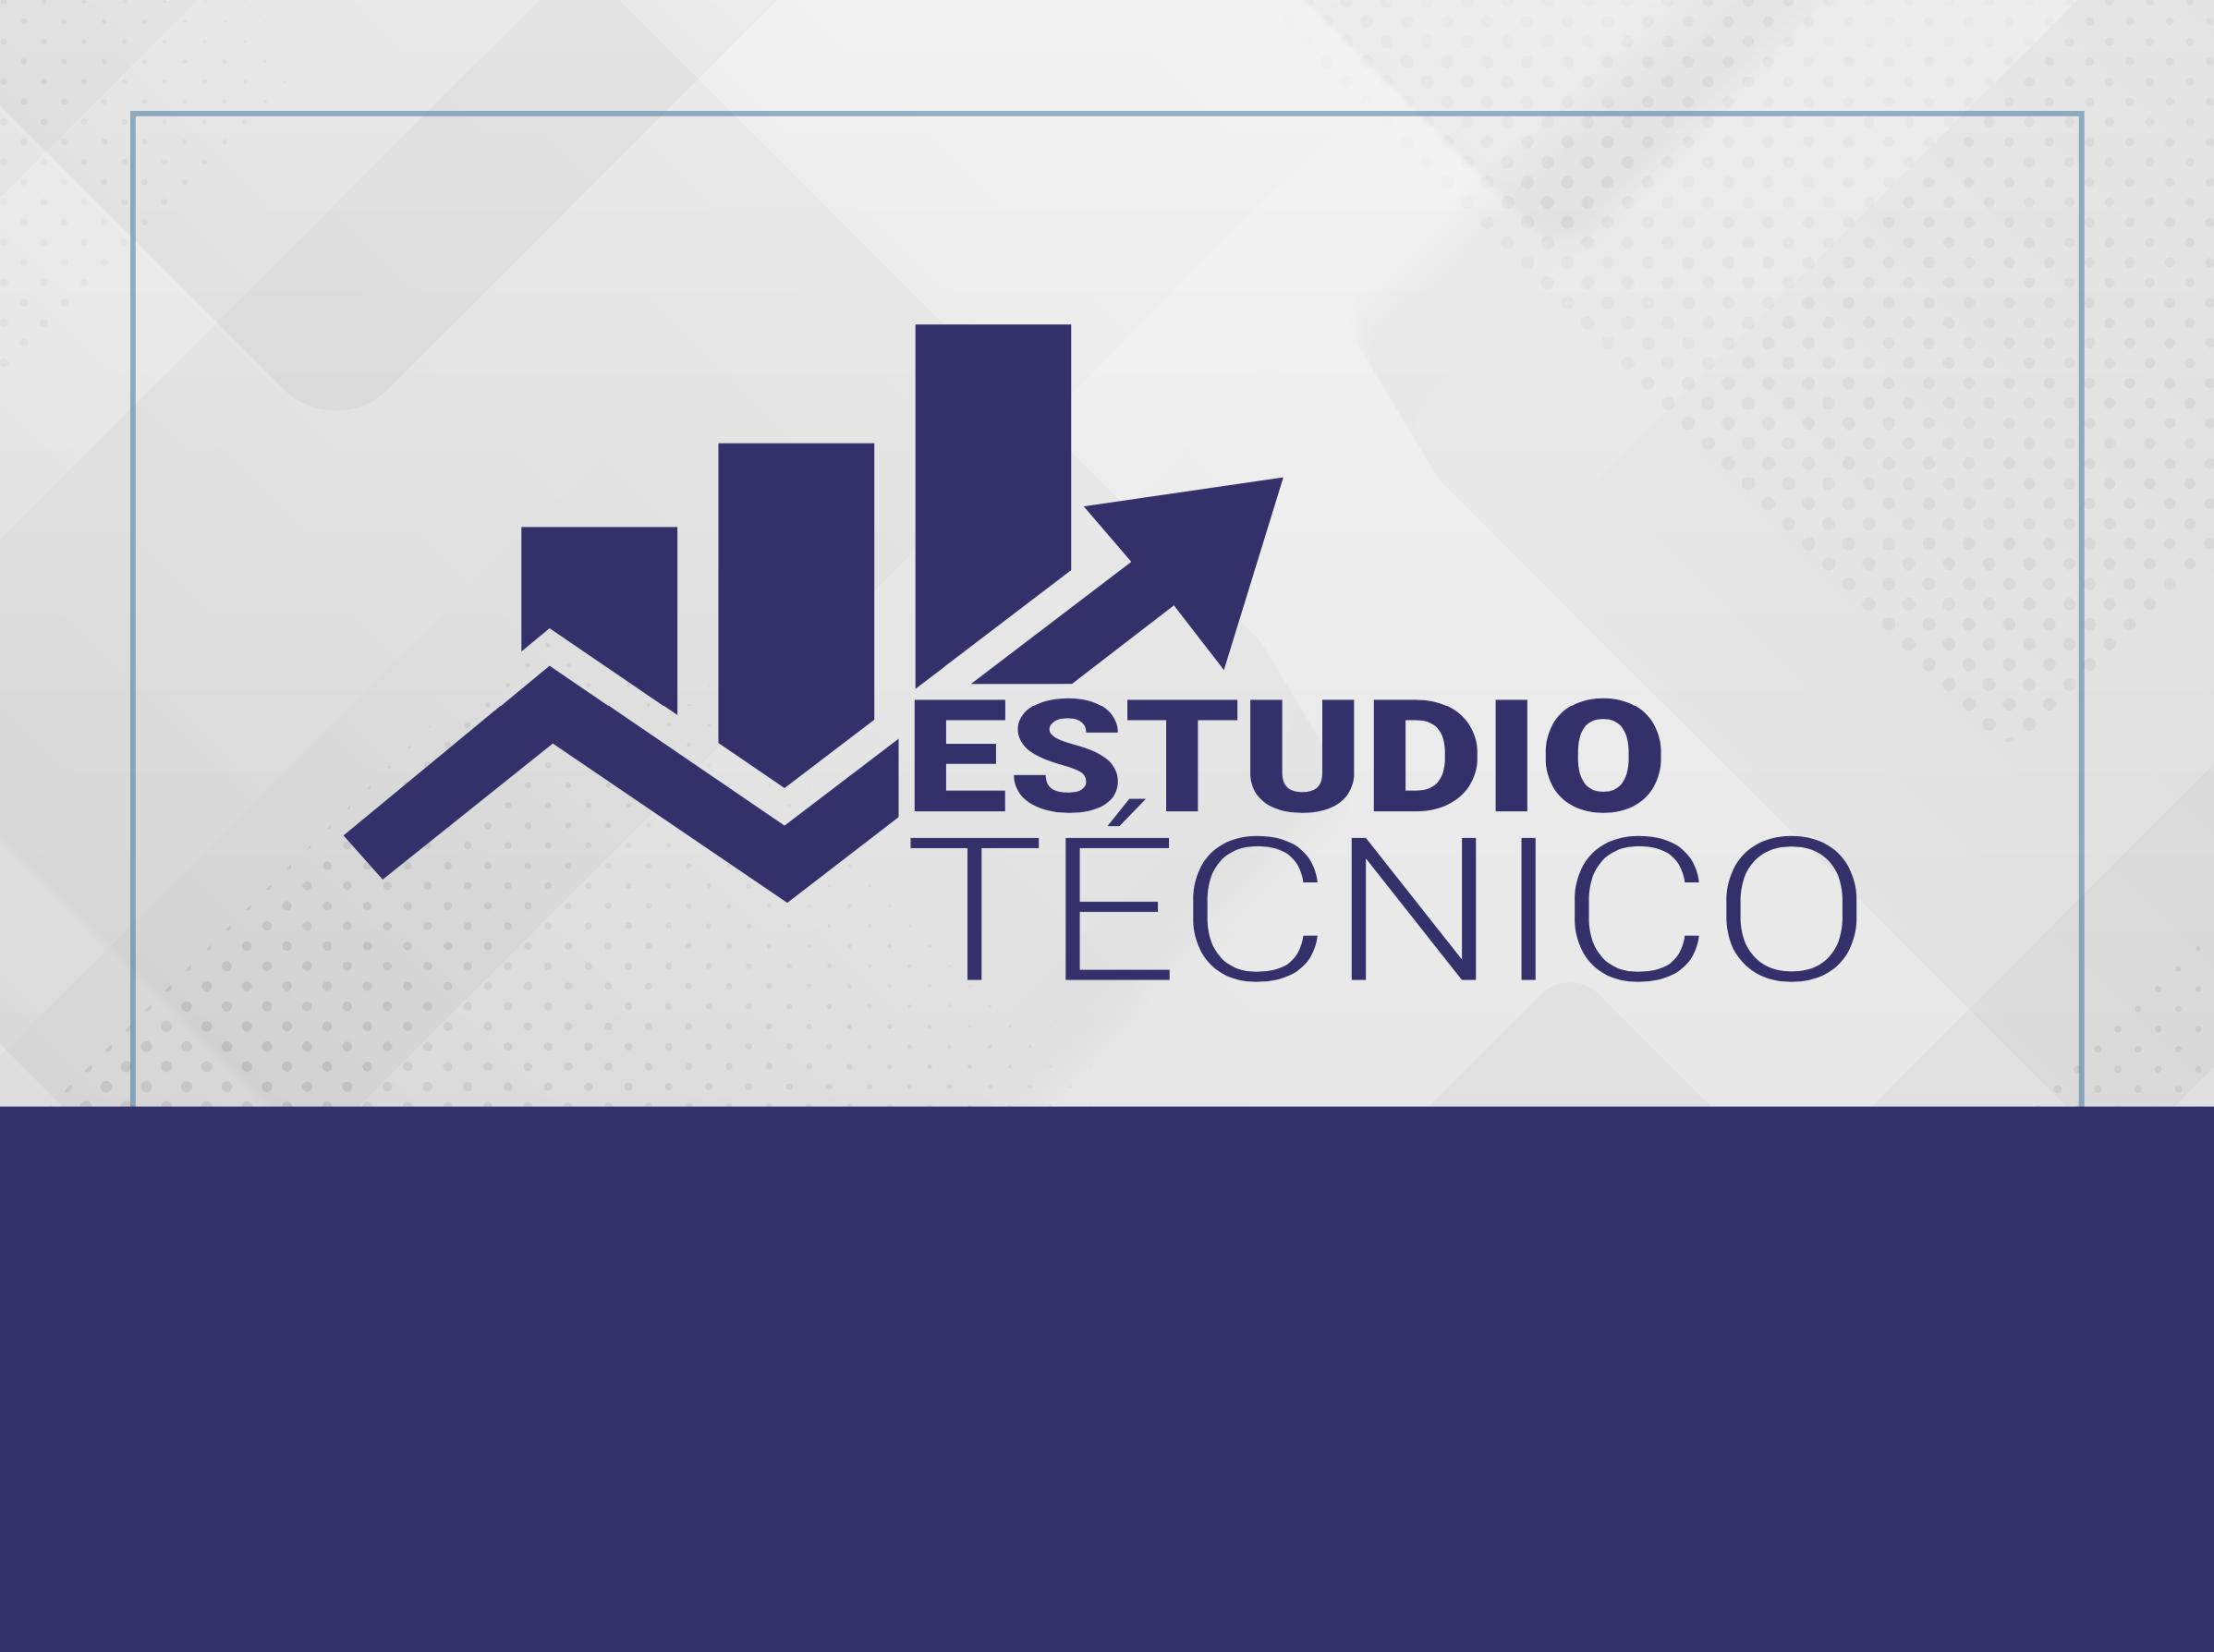 Estudio técnico 2017-2018